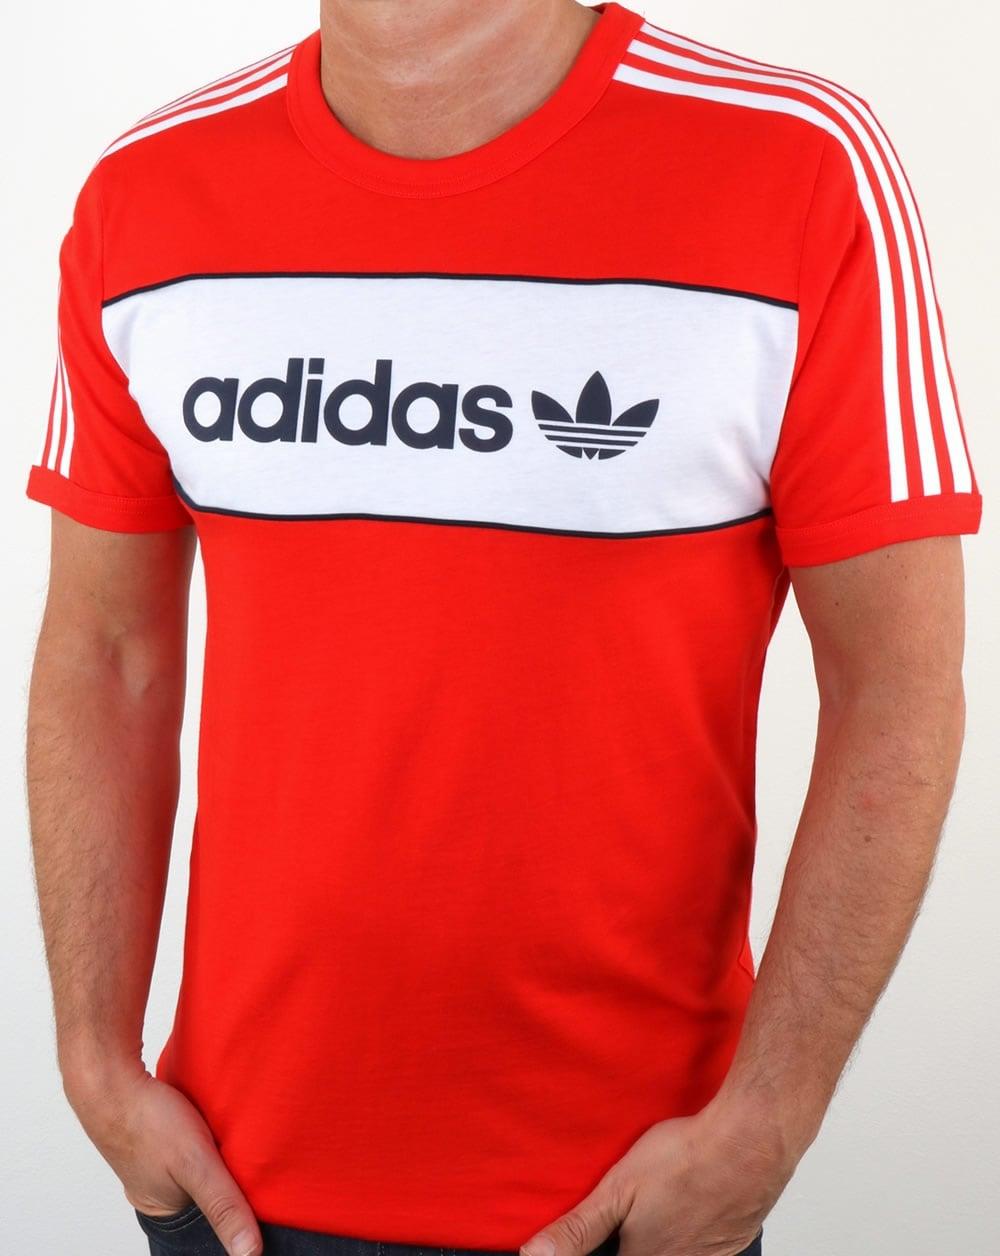 Adidas originals block t shirt core red trefoil tee retro for Adidas classic t shirt